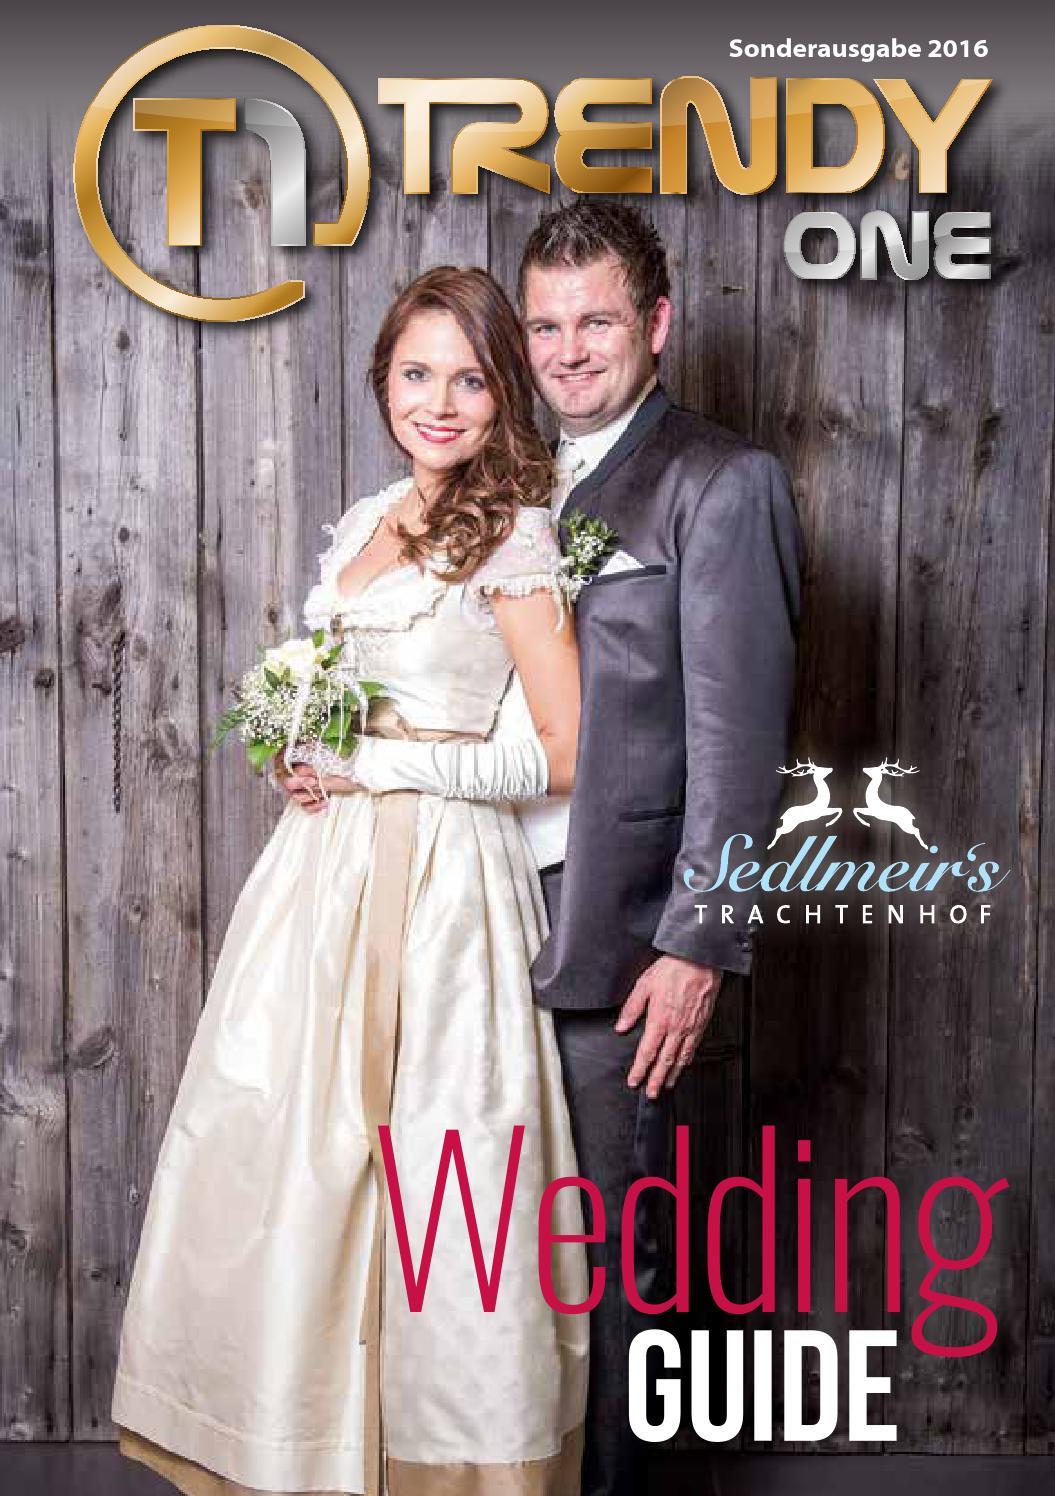 TRENDYone | Wedding Guide 2016 by ad can do GmbH & Co. KG - issuu